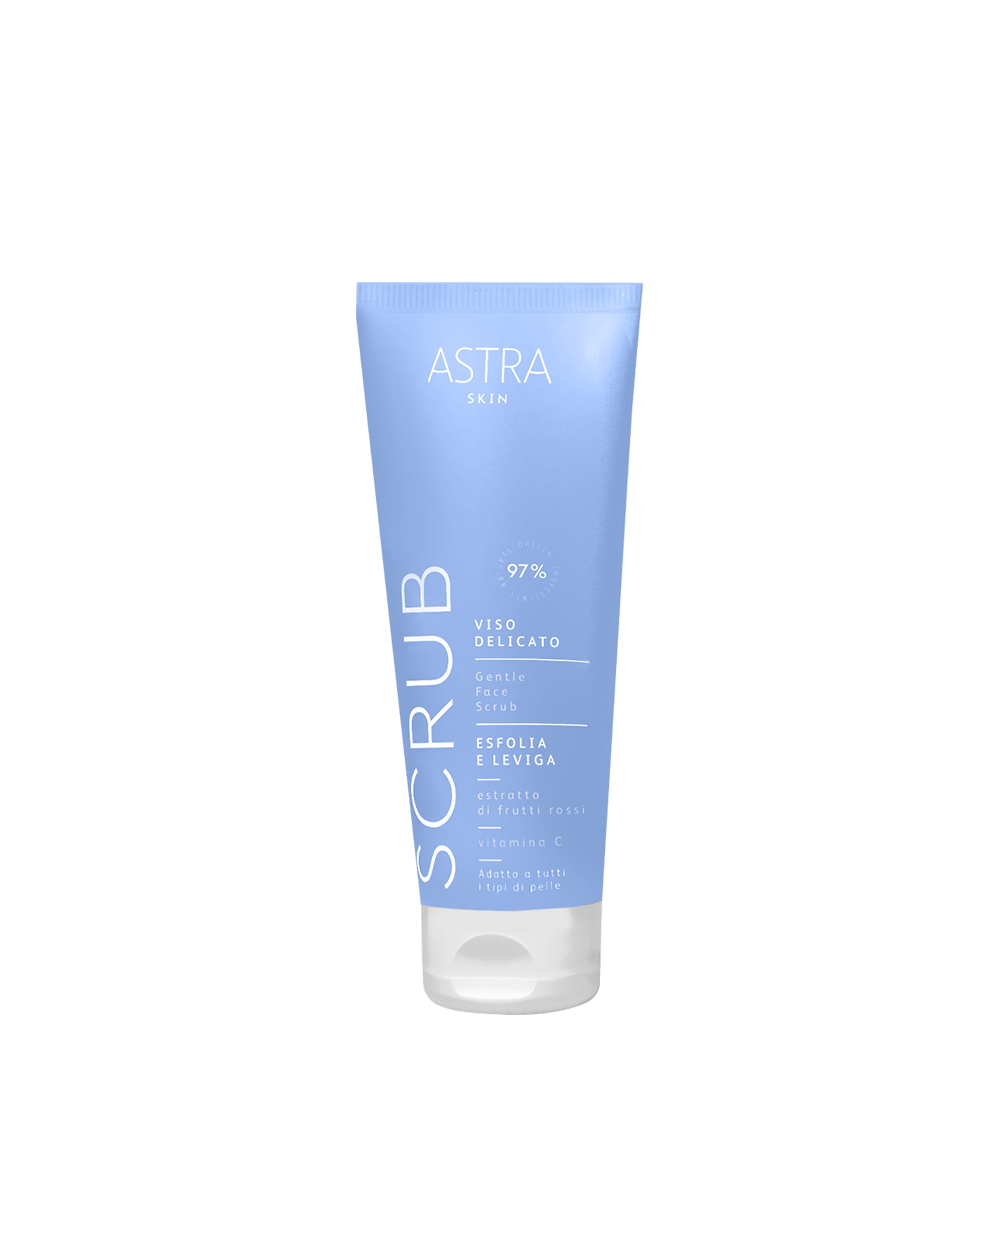 Astra Skin - Scrub